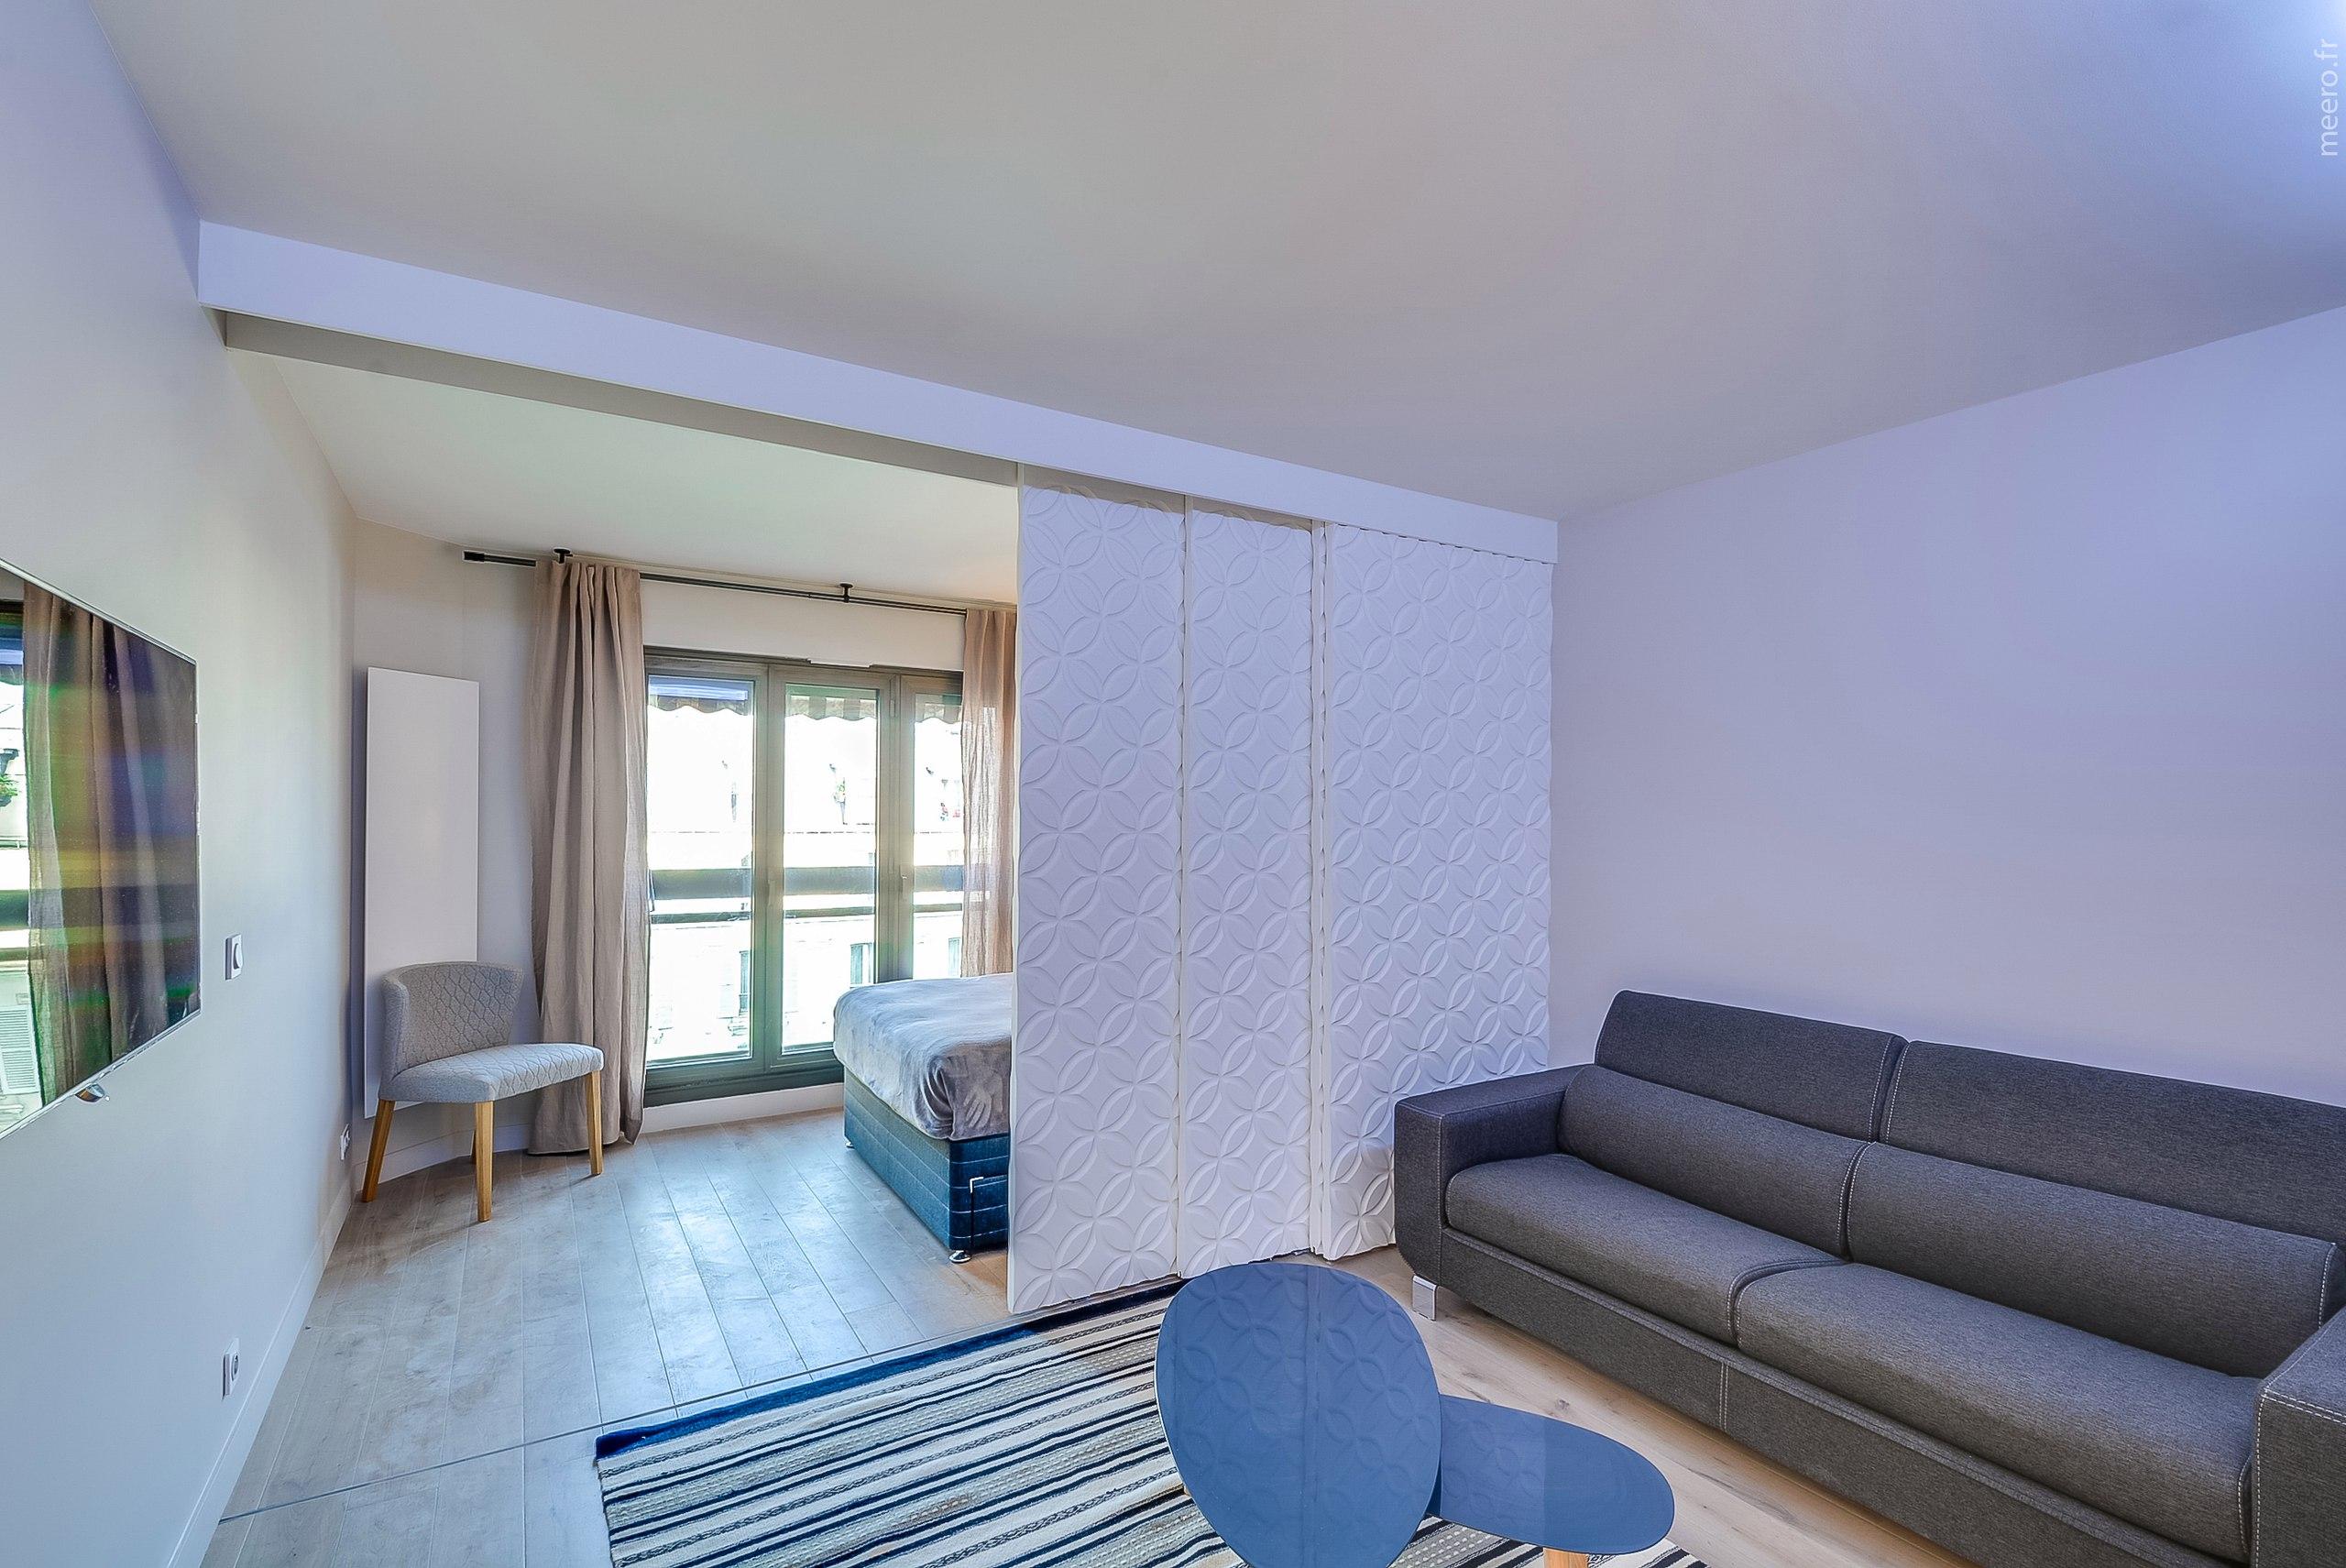 Интерьер квартиры-студии 29 м в Париже.